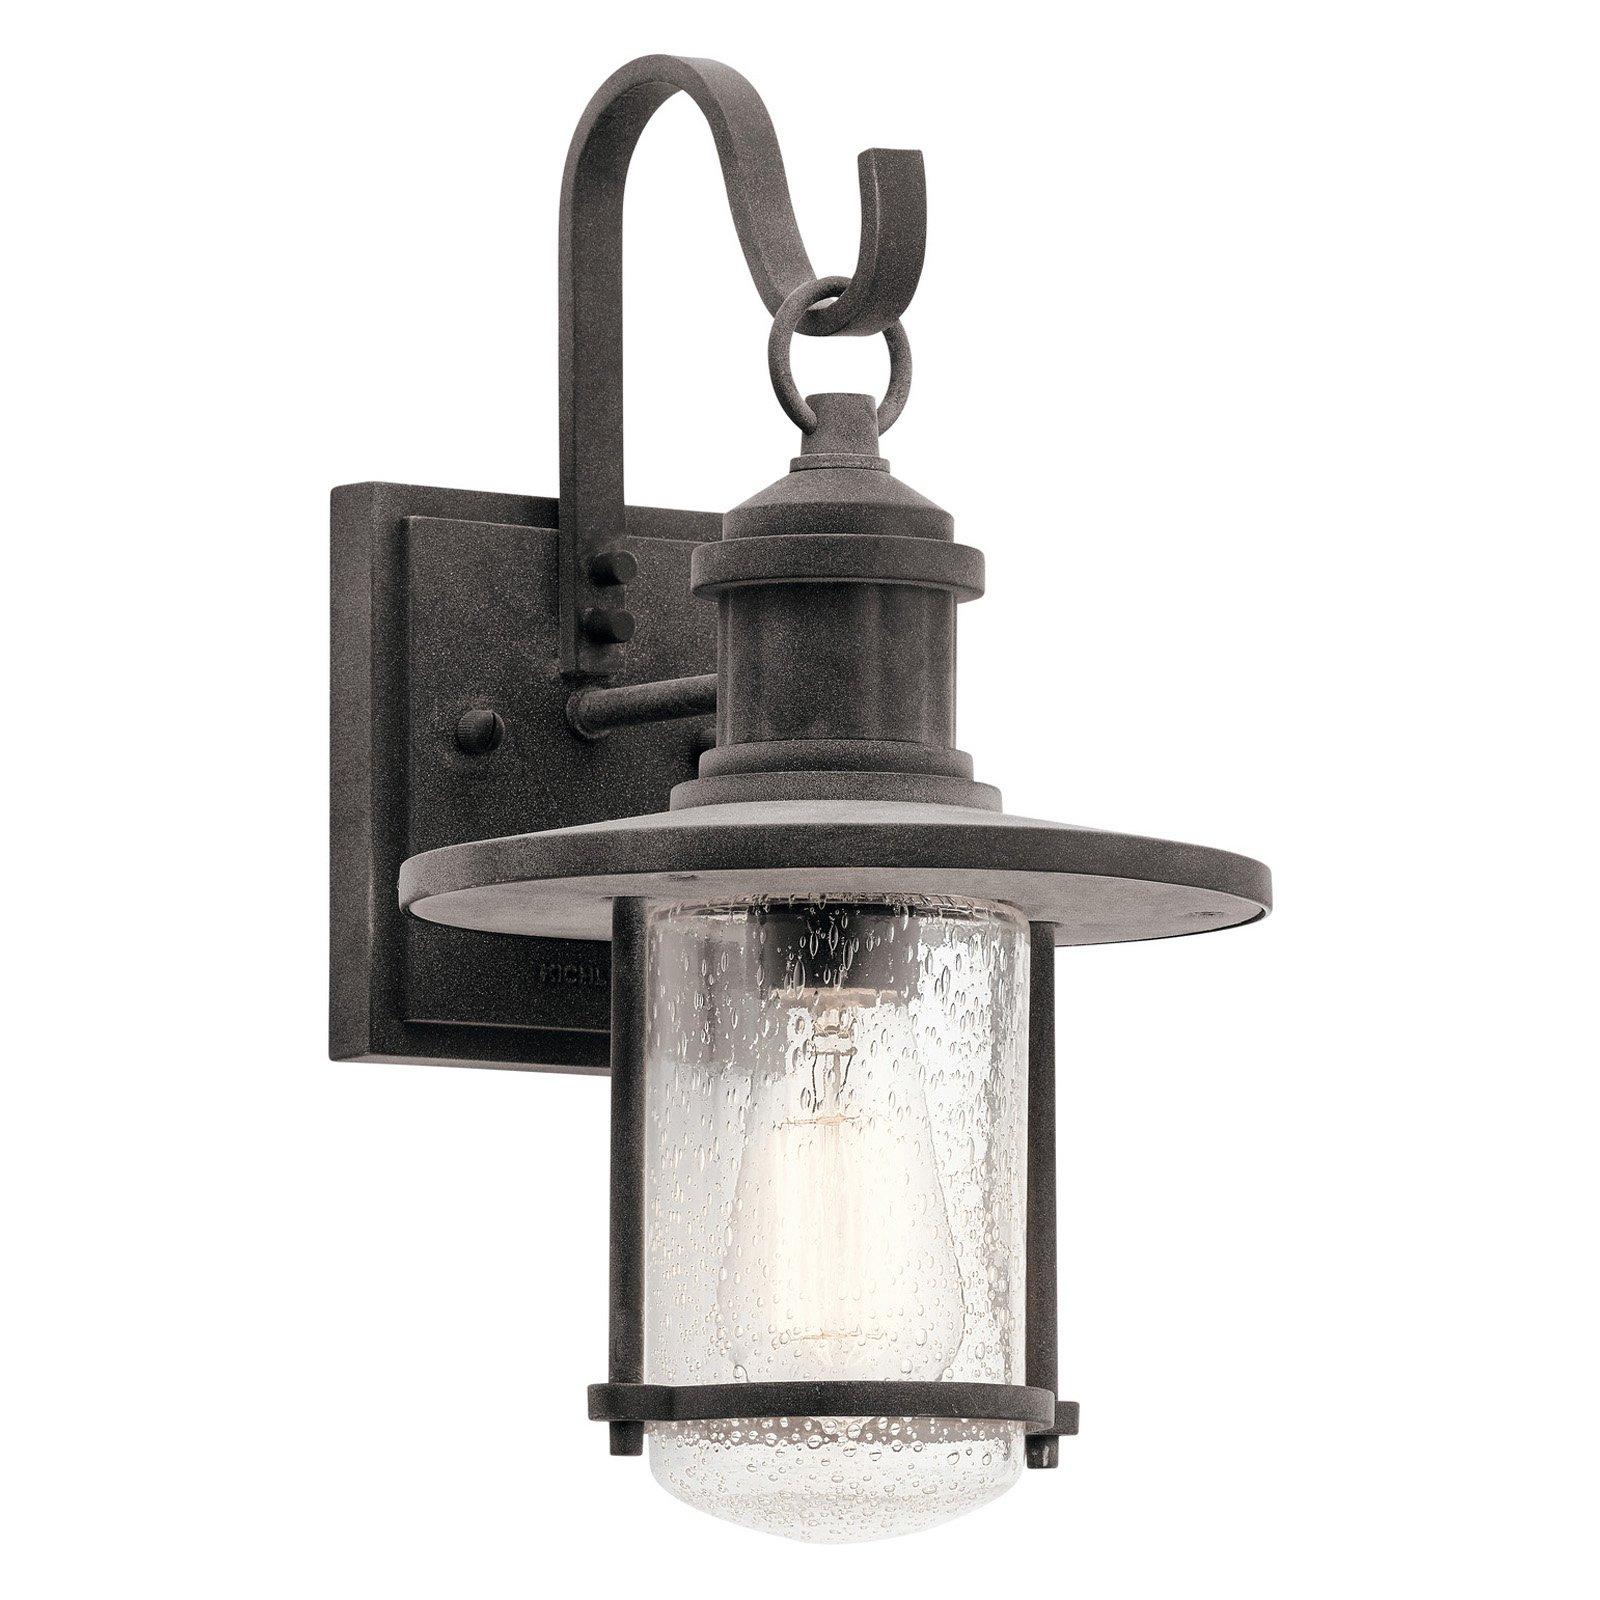 Kichler Riverwood 49192 Outdoor Wall Light